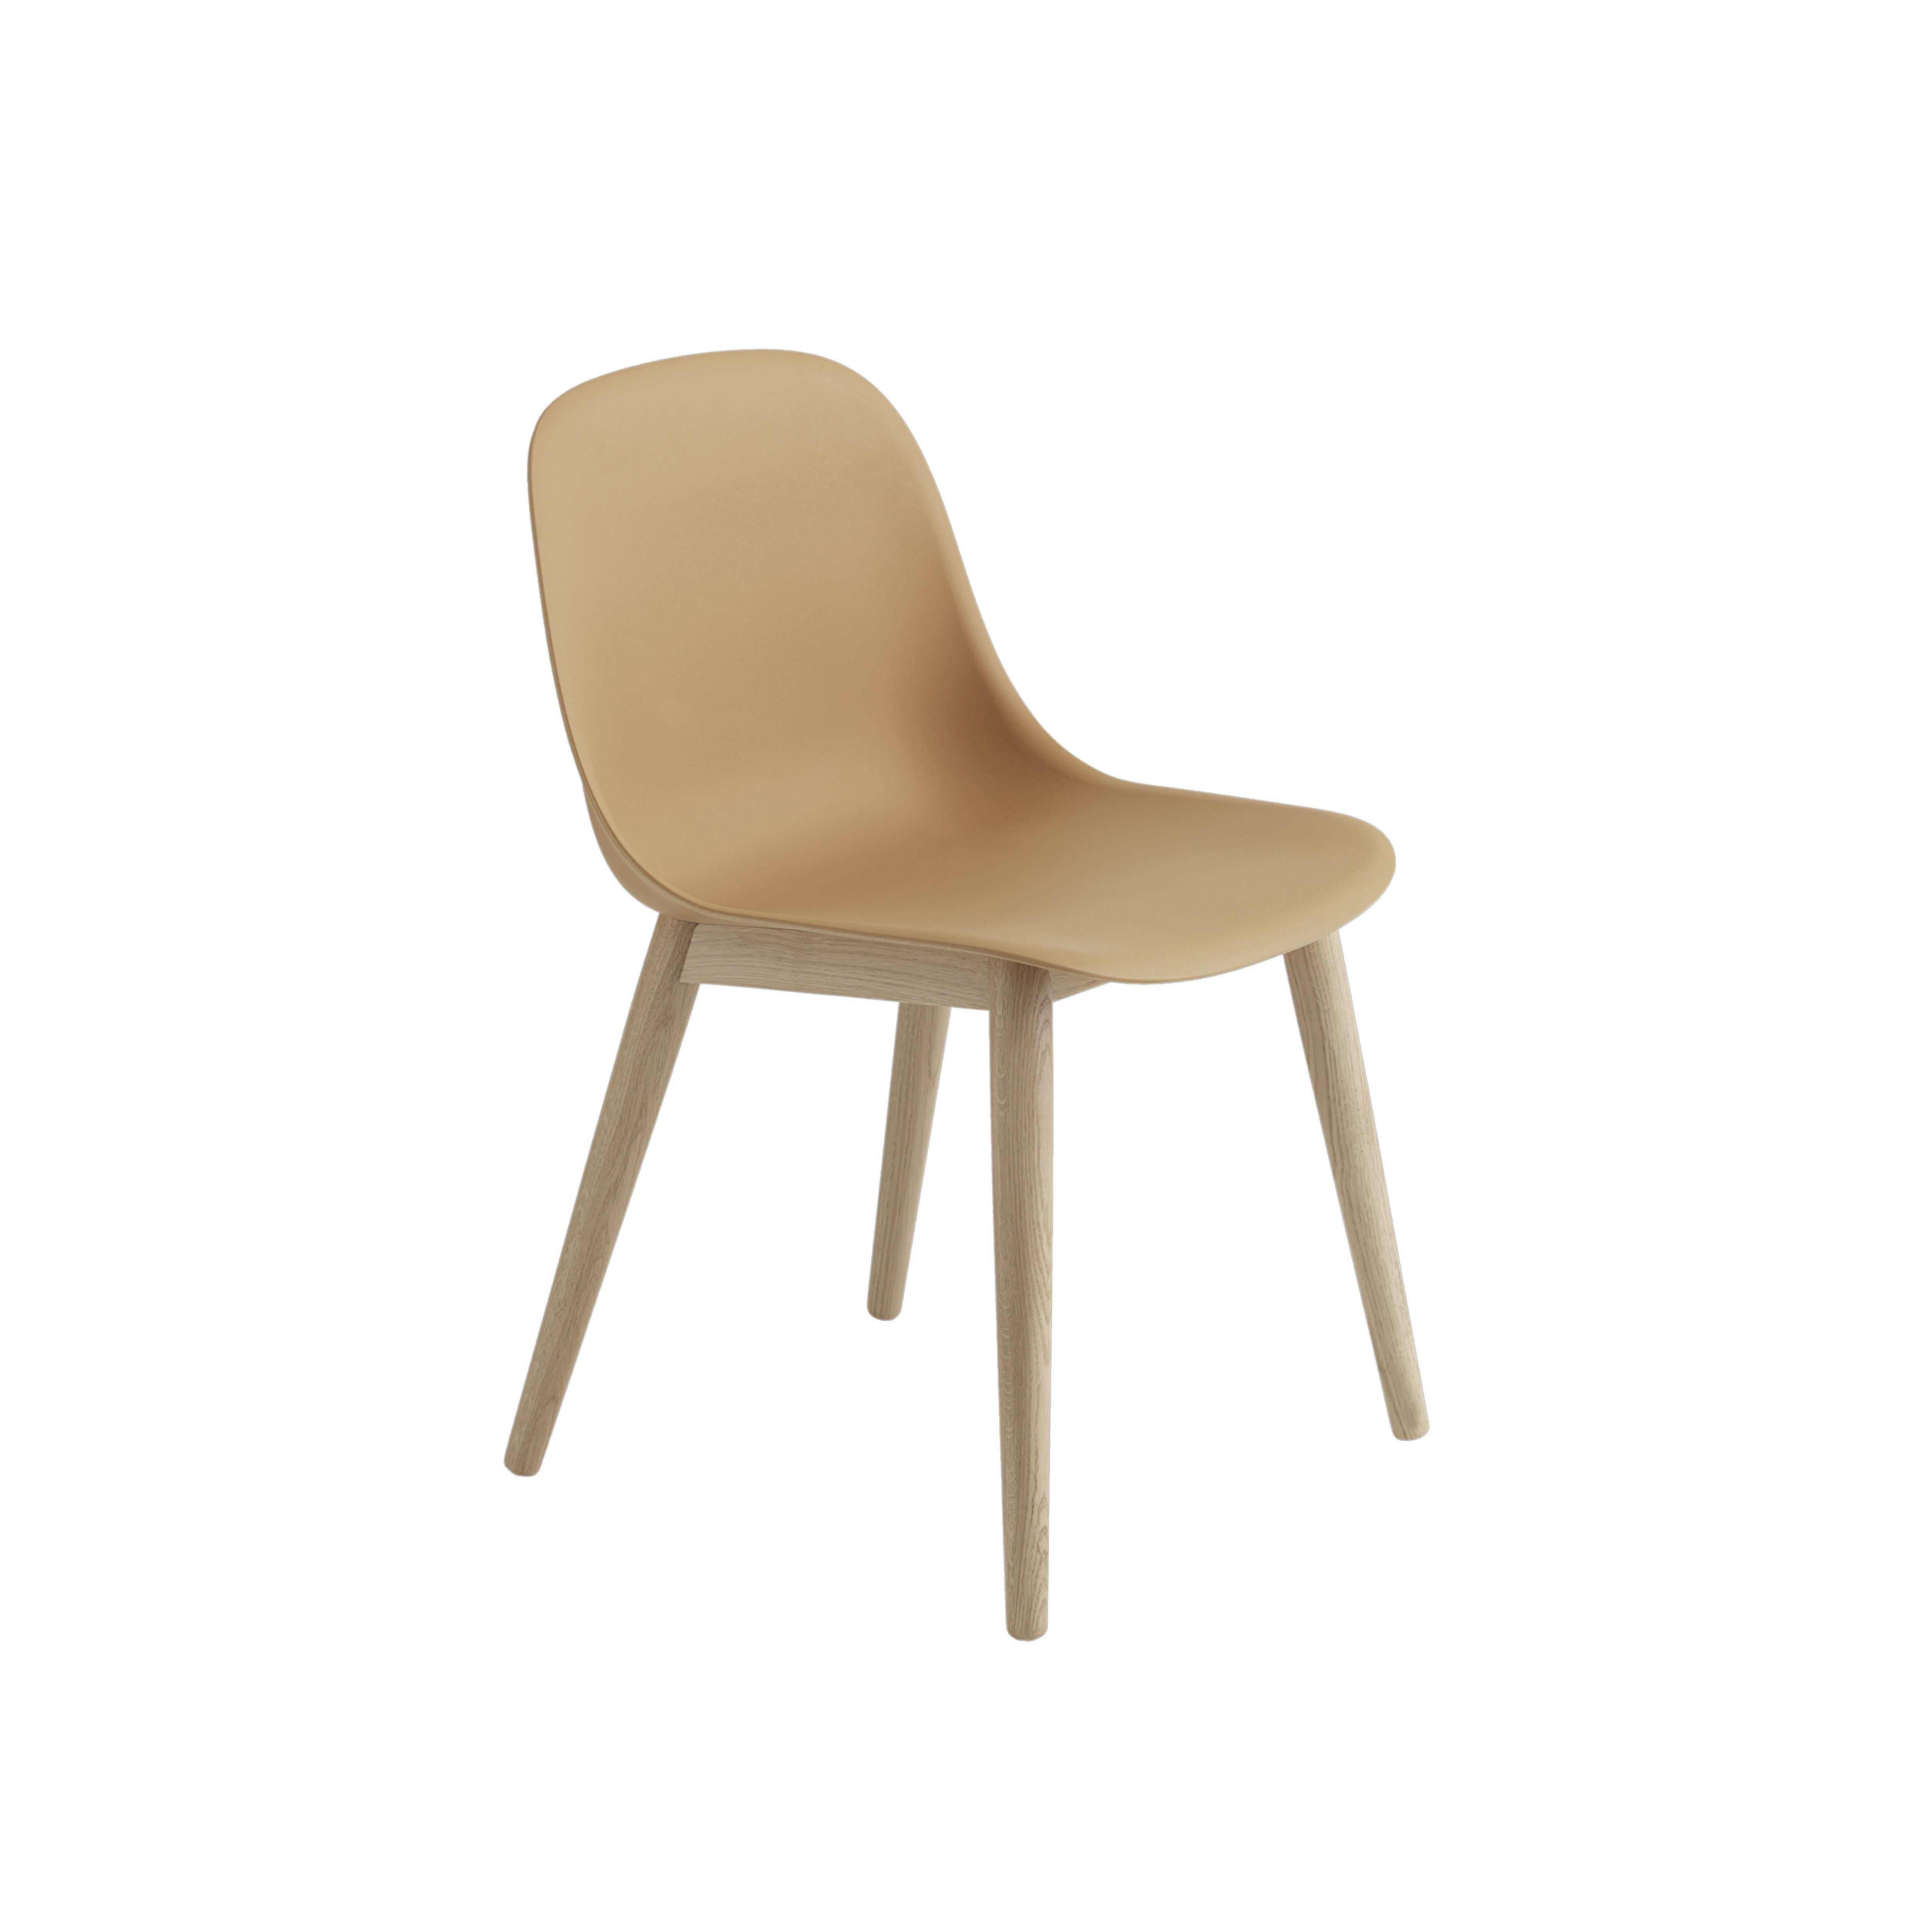 muuto fiber side chair wooden base. Black Bedroom Furniture Sets. Home Design Ideas